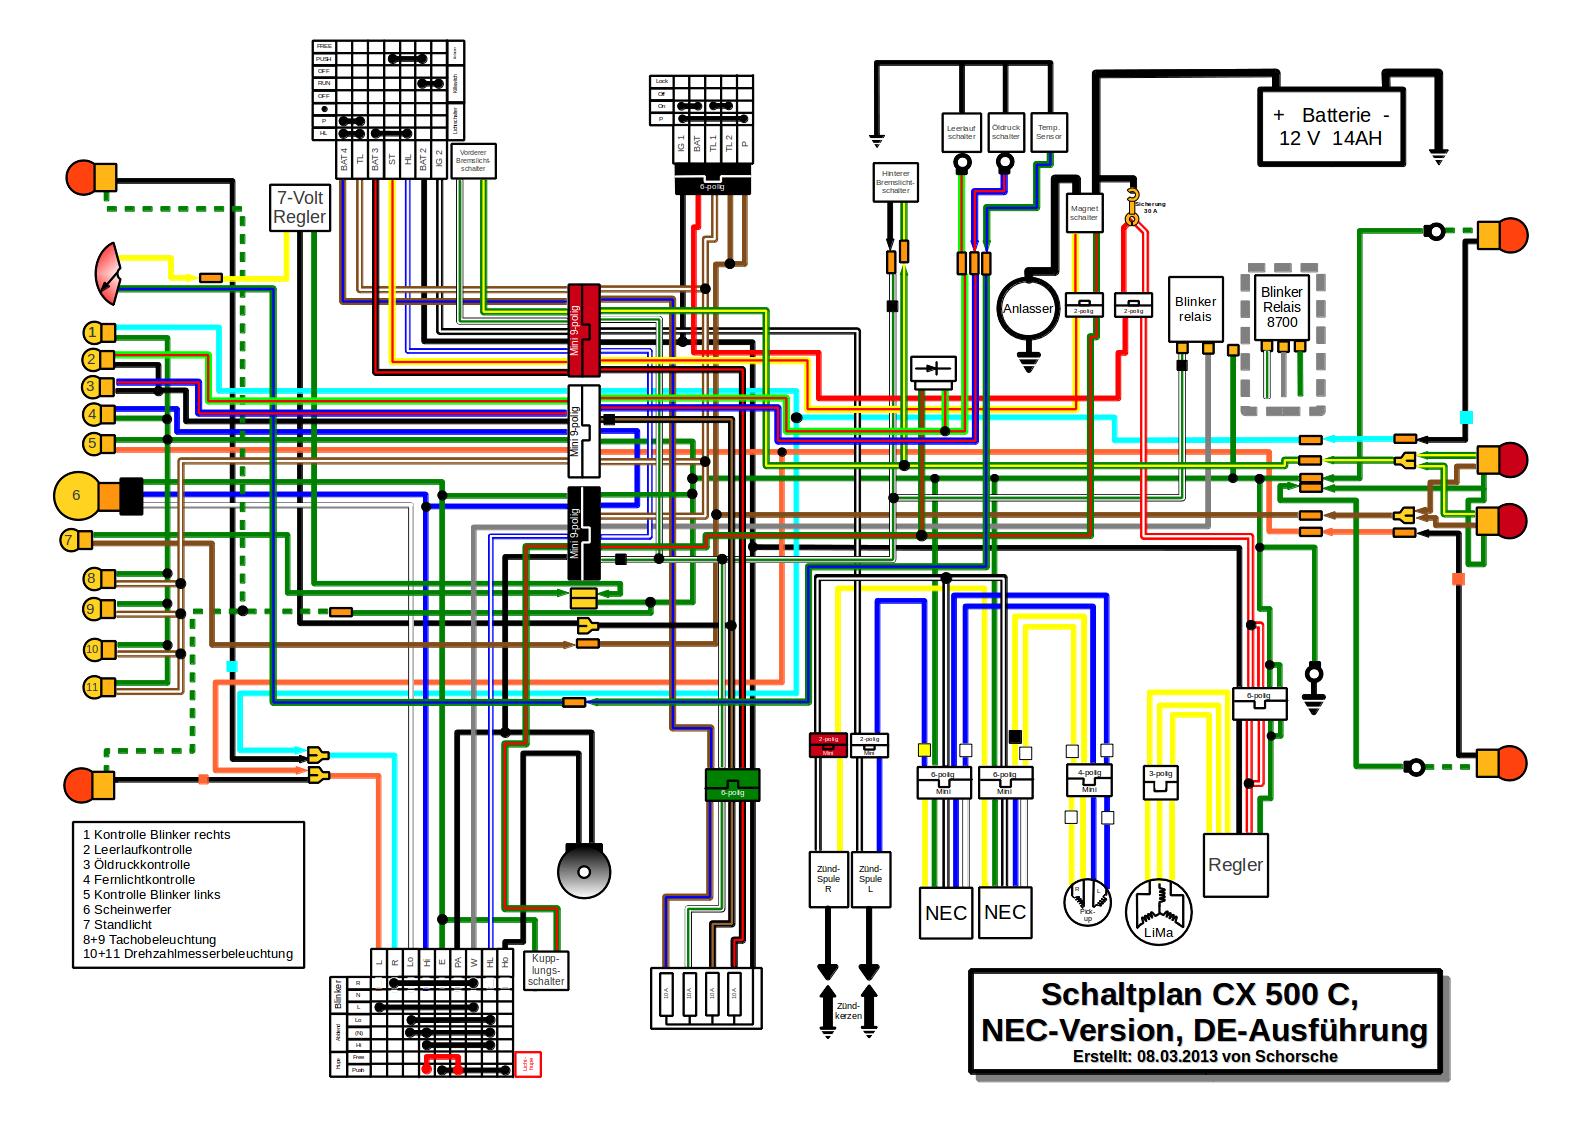 Cx500 Wiring Diagram - seniorsclub.it wires-drama - wires -drama.pietrodavico.it